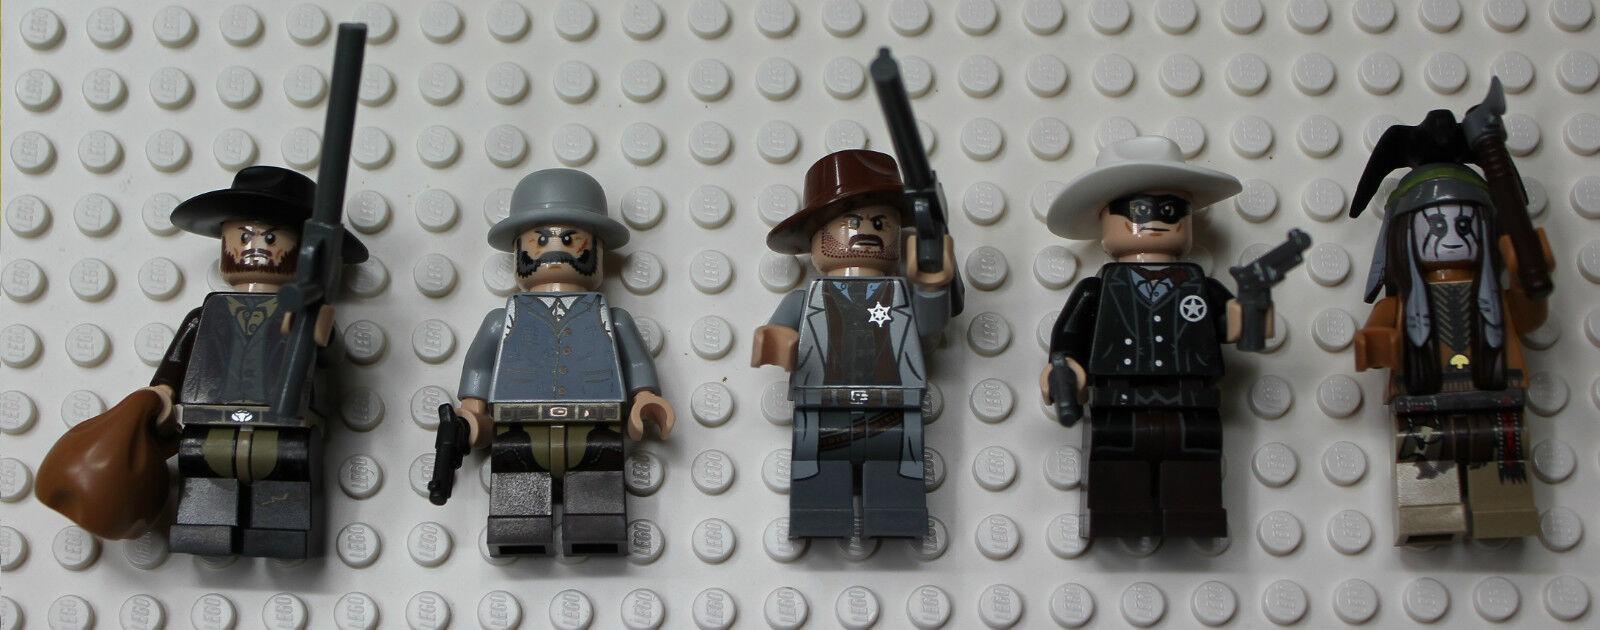 Lego Lone Ranger Colby City Showdown MINIFIGURES_79109